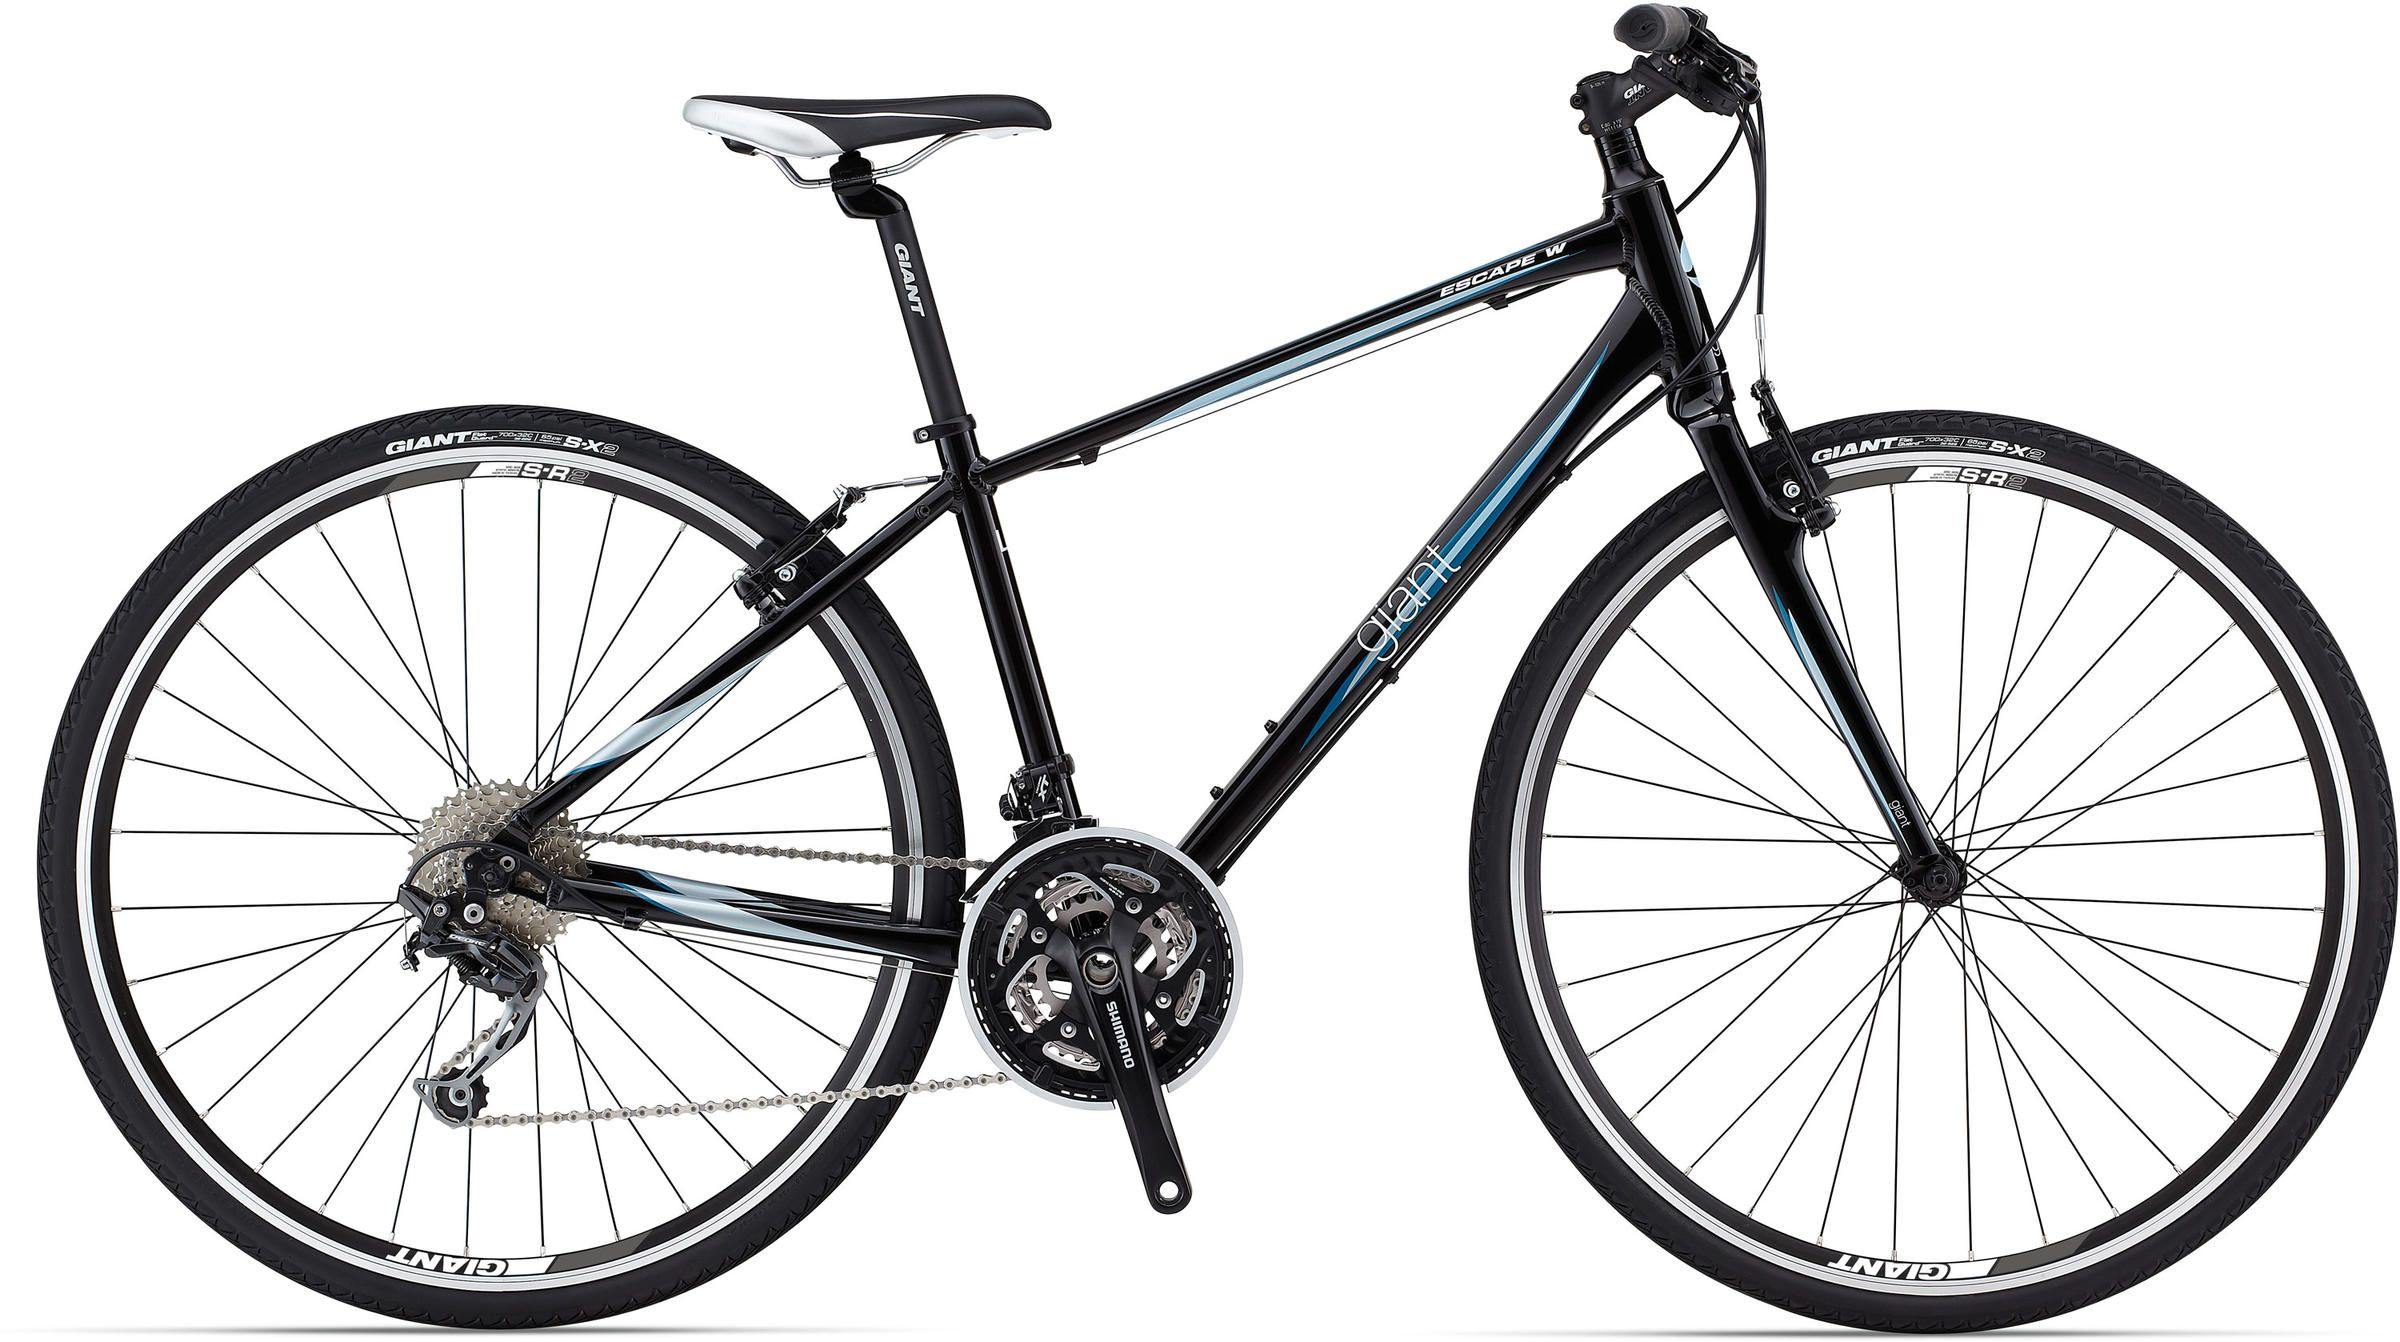 Giant Escape 0 W Women S Valley Stove Cycle Ltd Kentville Nova Scotia Giant Bicycles Bicycle City Bike